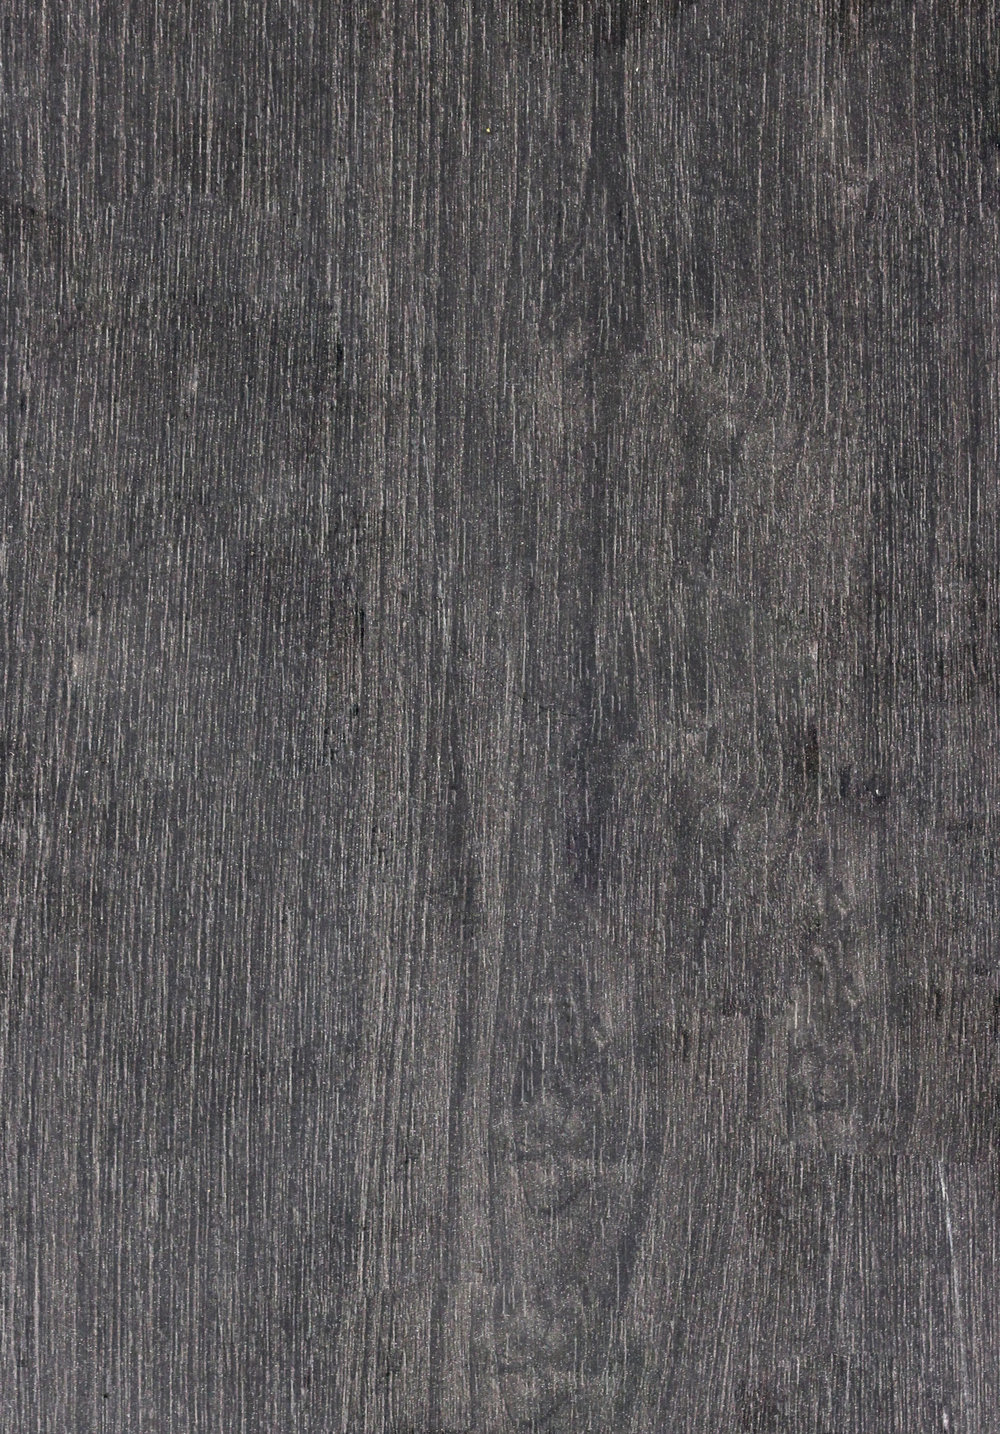 K016PW -  CARBON MARINE WOOD